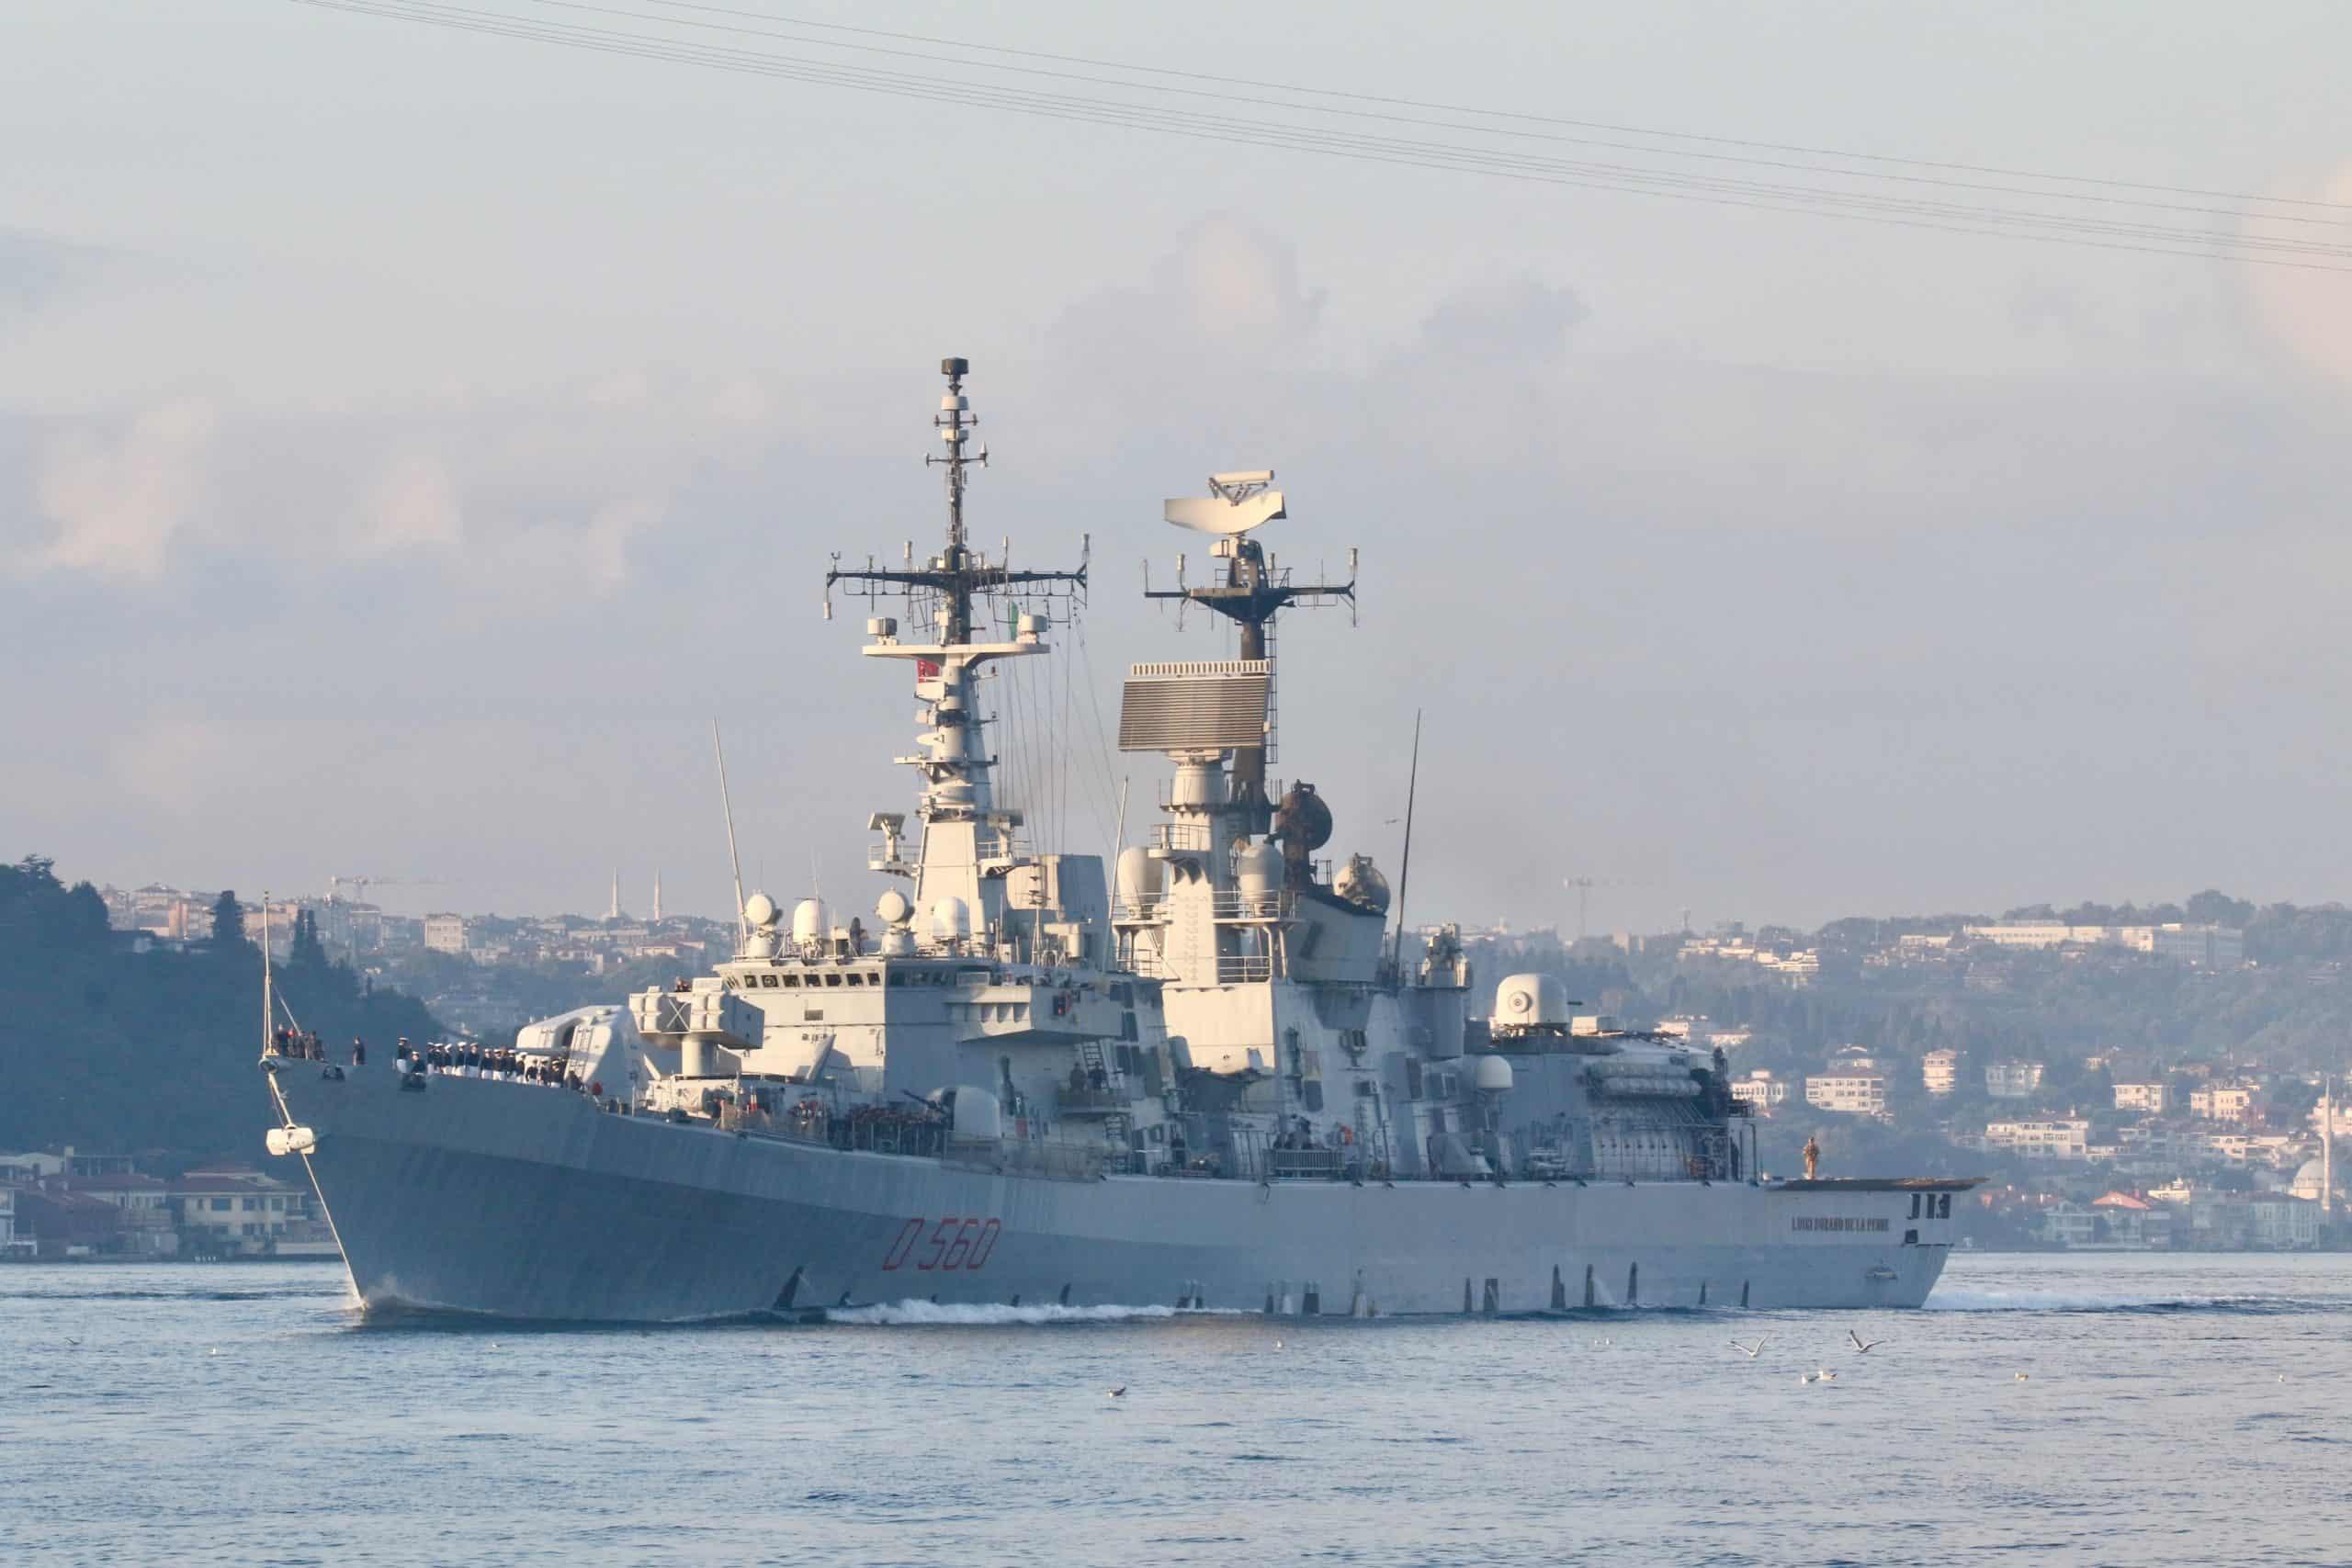 Італійський есмінець Luigi Durand de la Penne (D560)